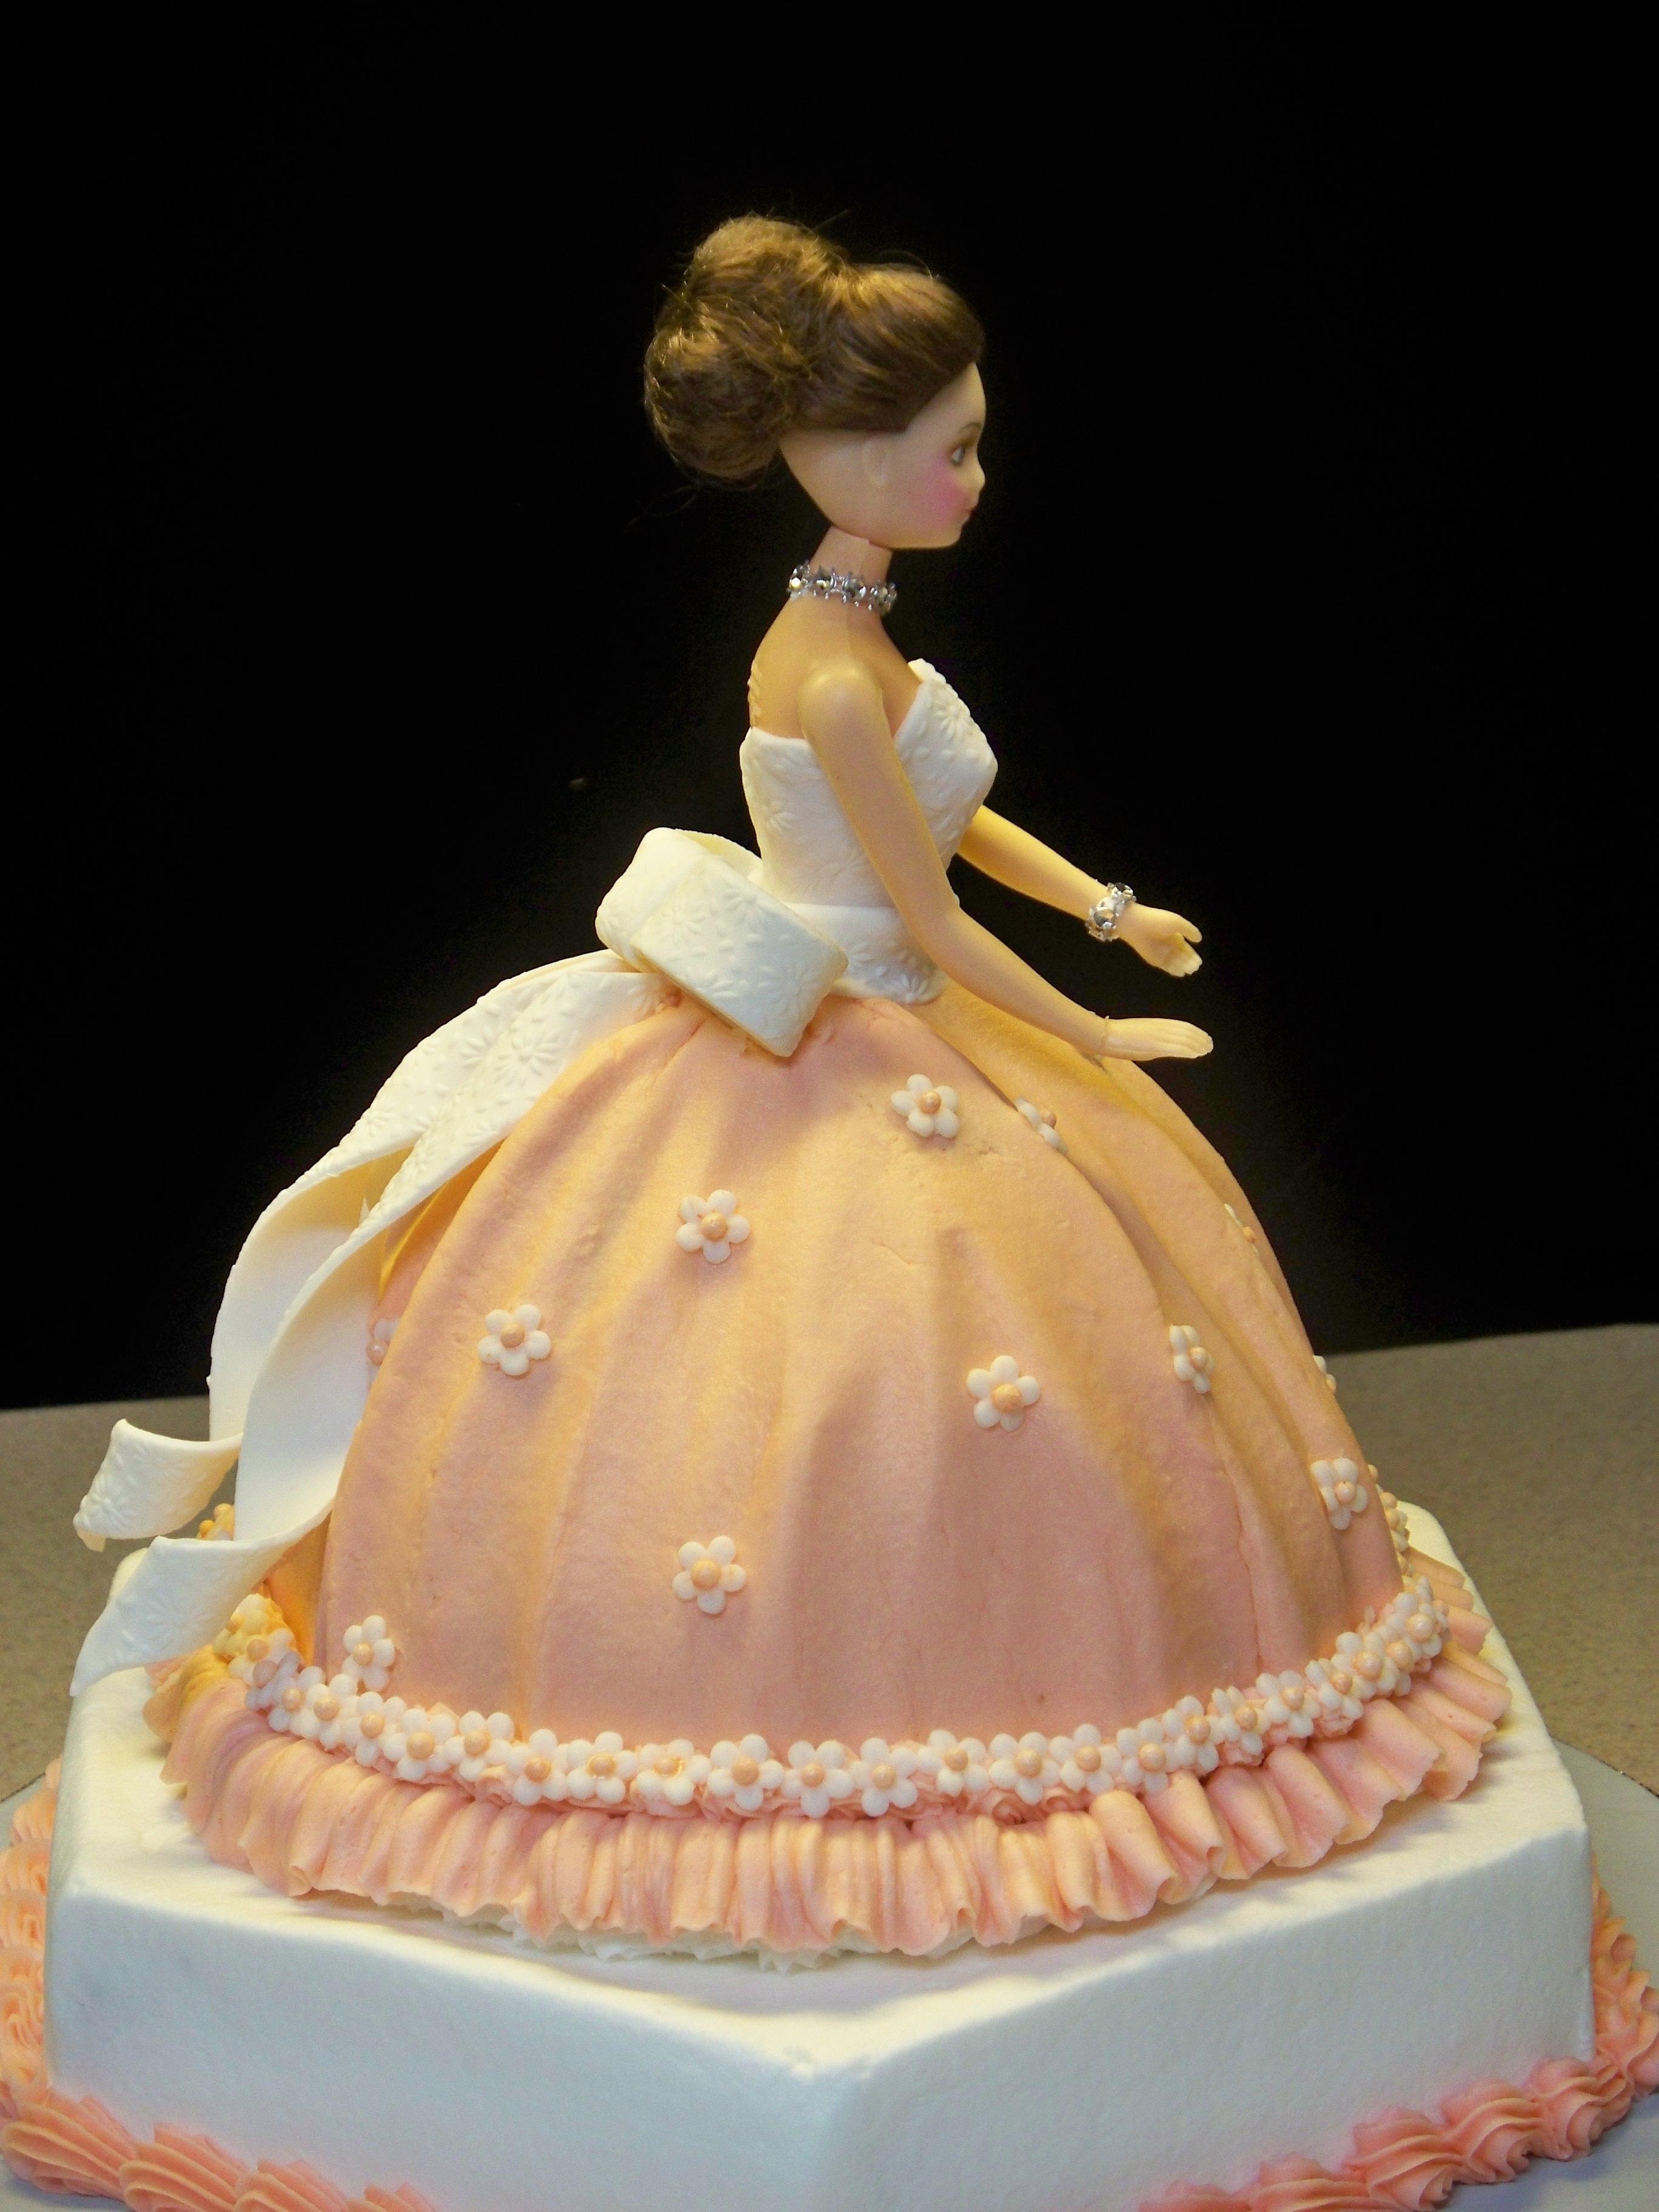 Doll Cake Images Download : Doll Cake - CakeCentral.com